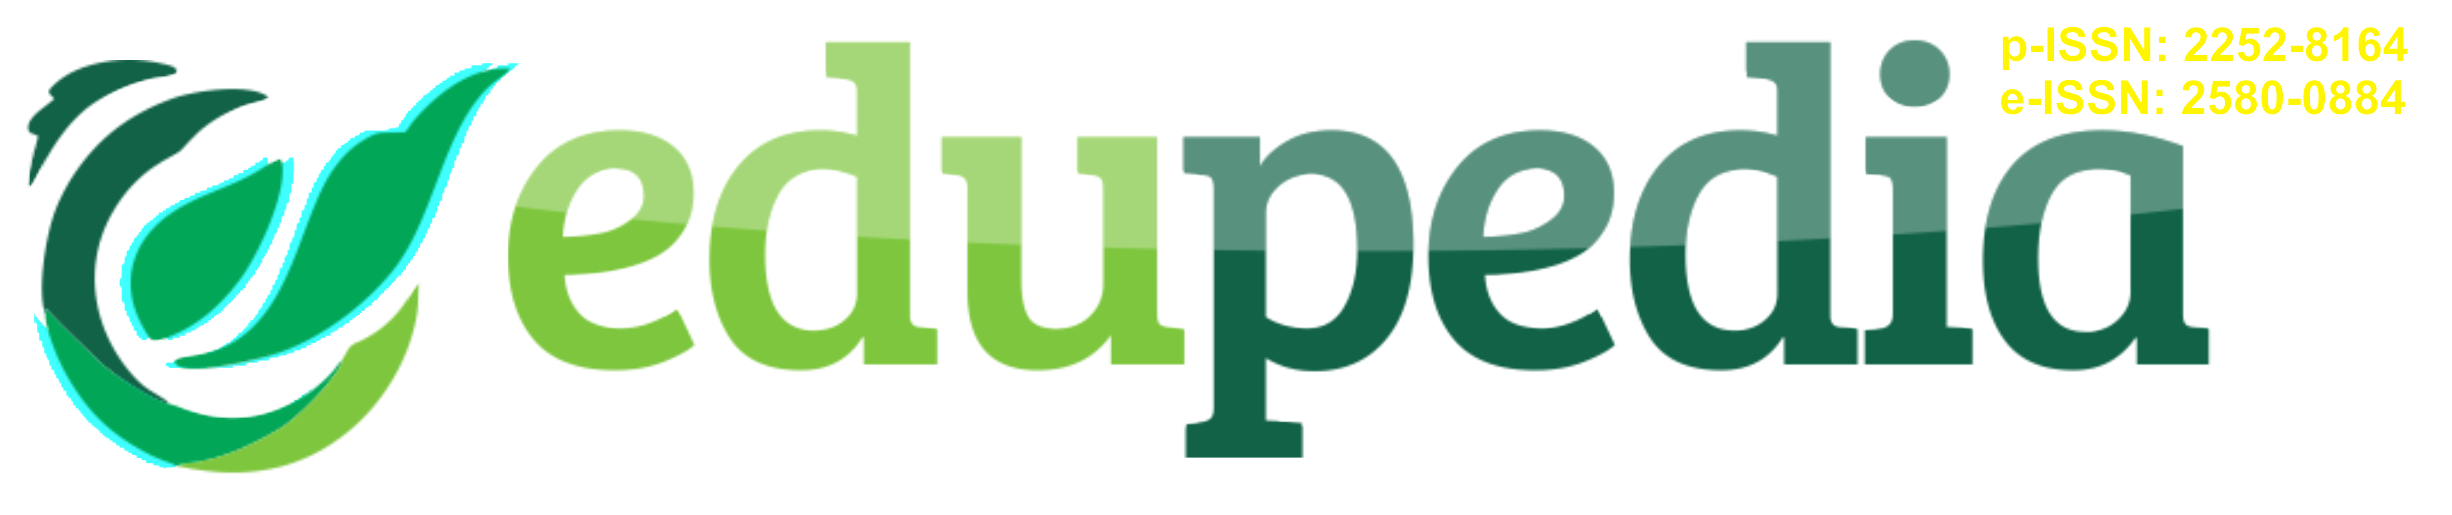 Edupedia : Jurnal Studi Pendidikan dan Pedagogi Islam